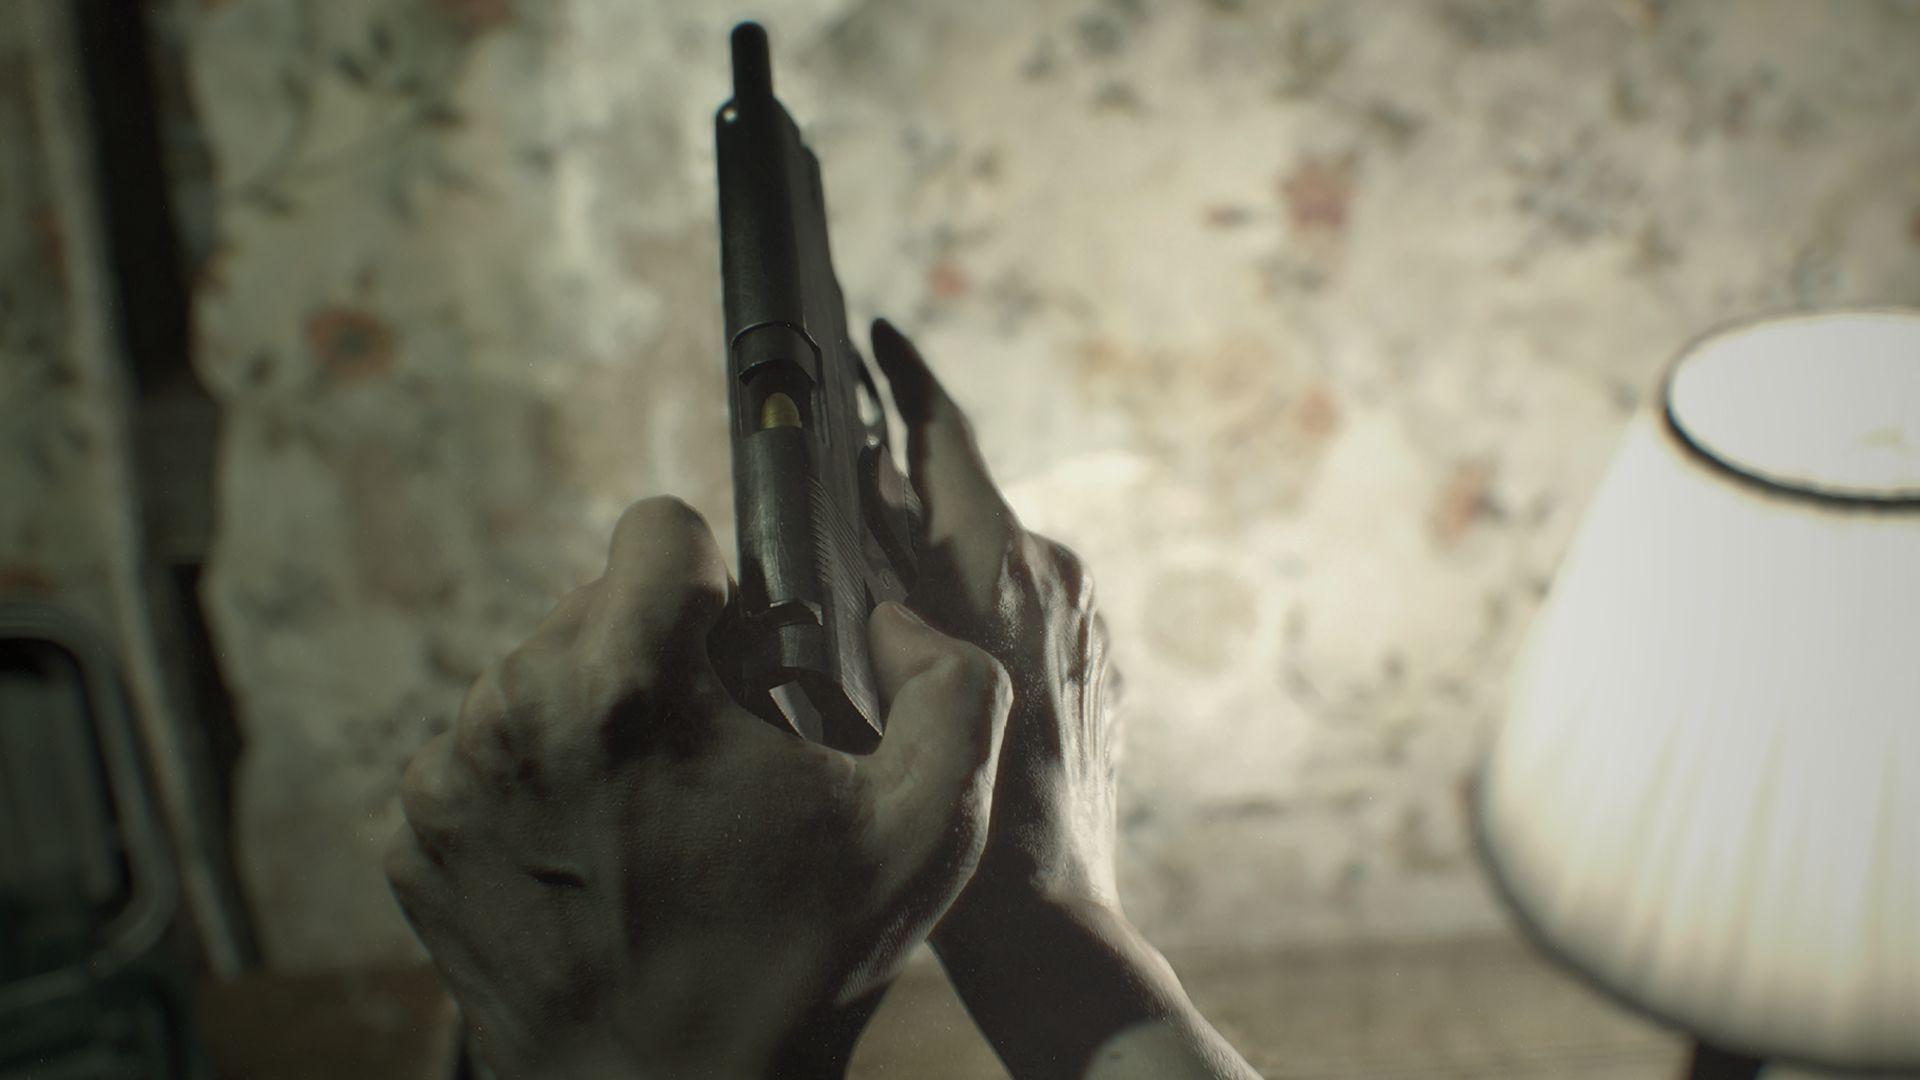 Review: Resident Evil 7 biohazard